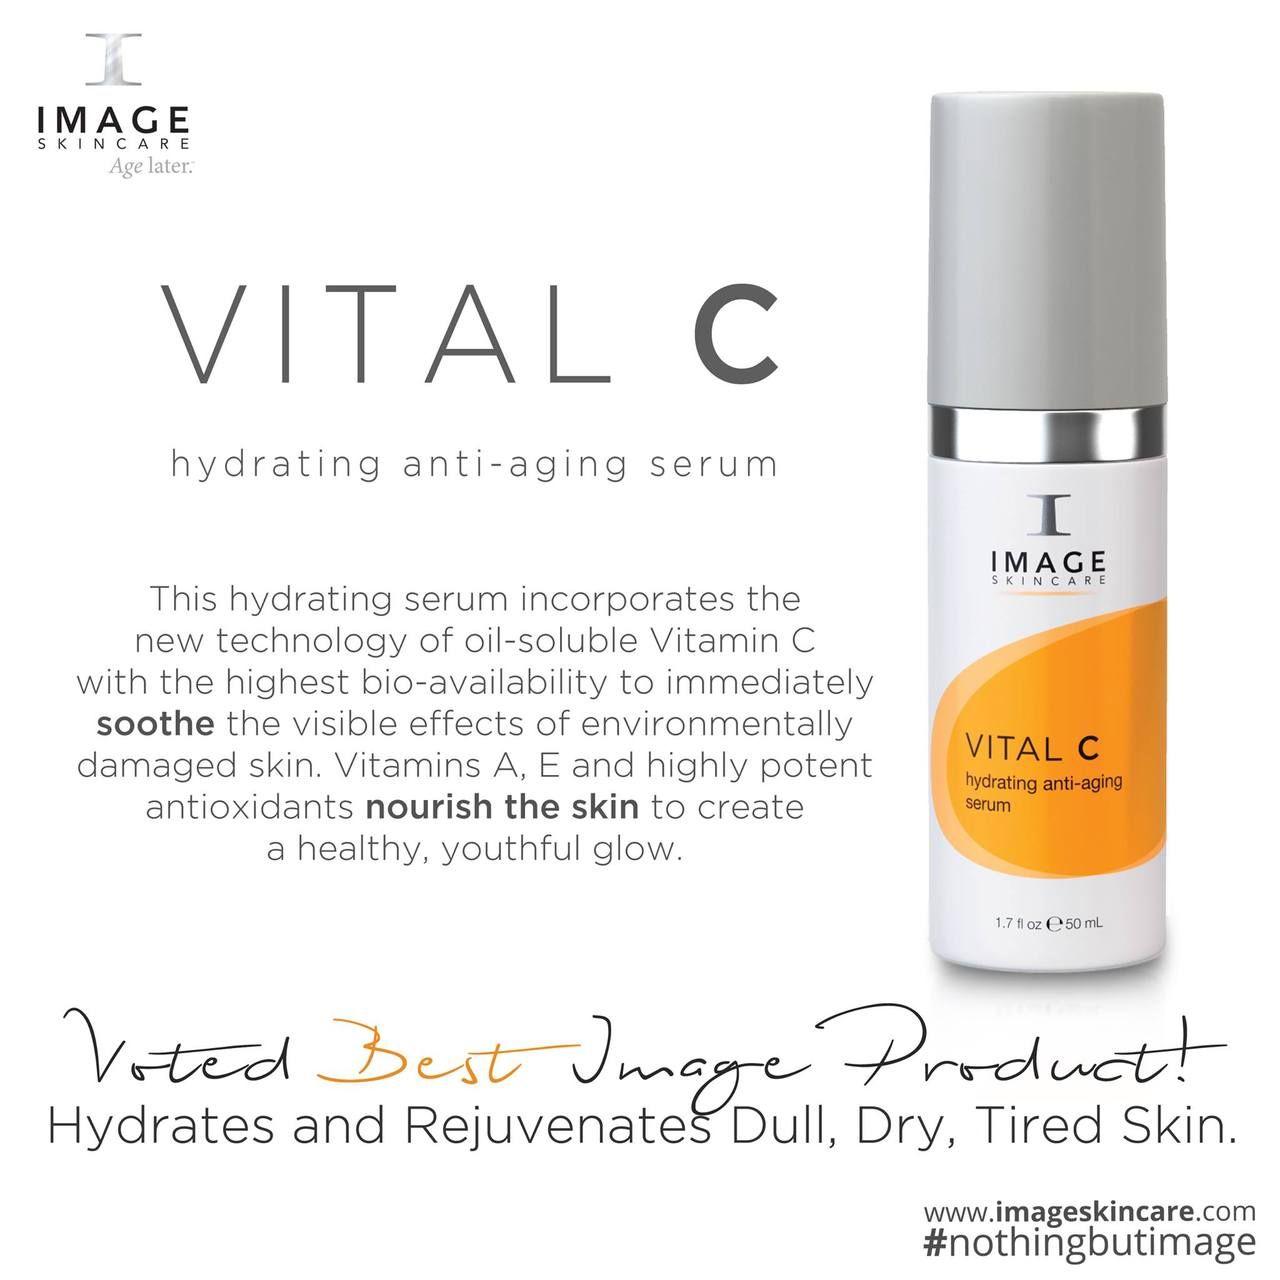 Productfeature Image Skincare Vital C Hydrating Anti Aging Serum This Hydrating Serum Incorporates The New Techn Image Skincare Anti Aging Serum Skin Care